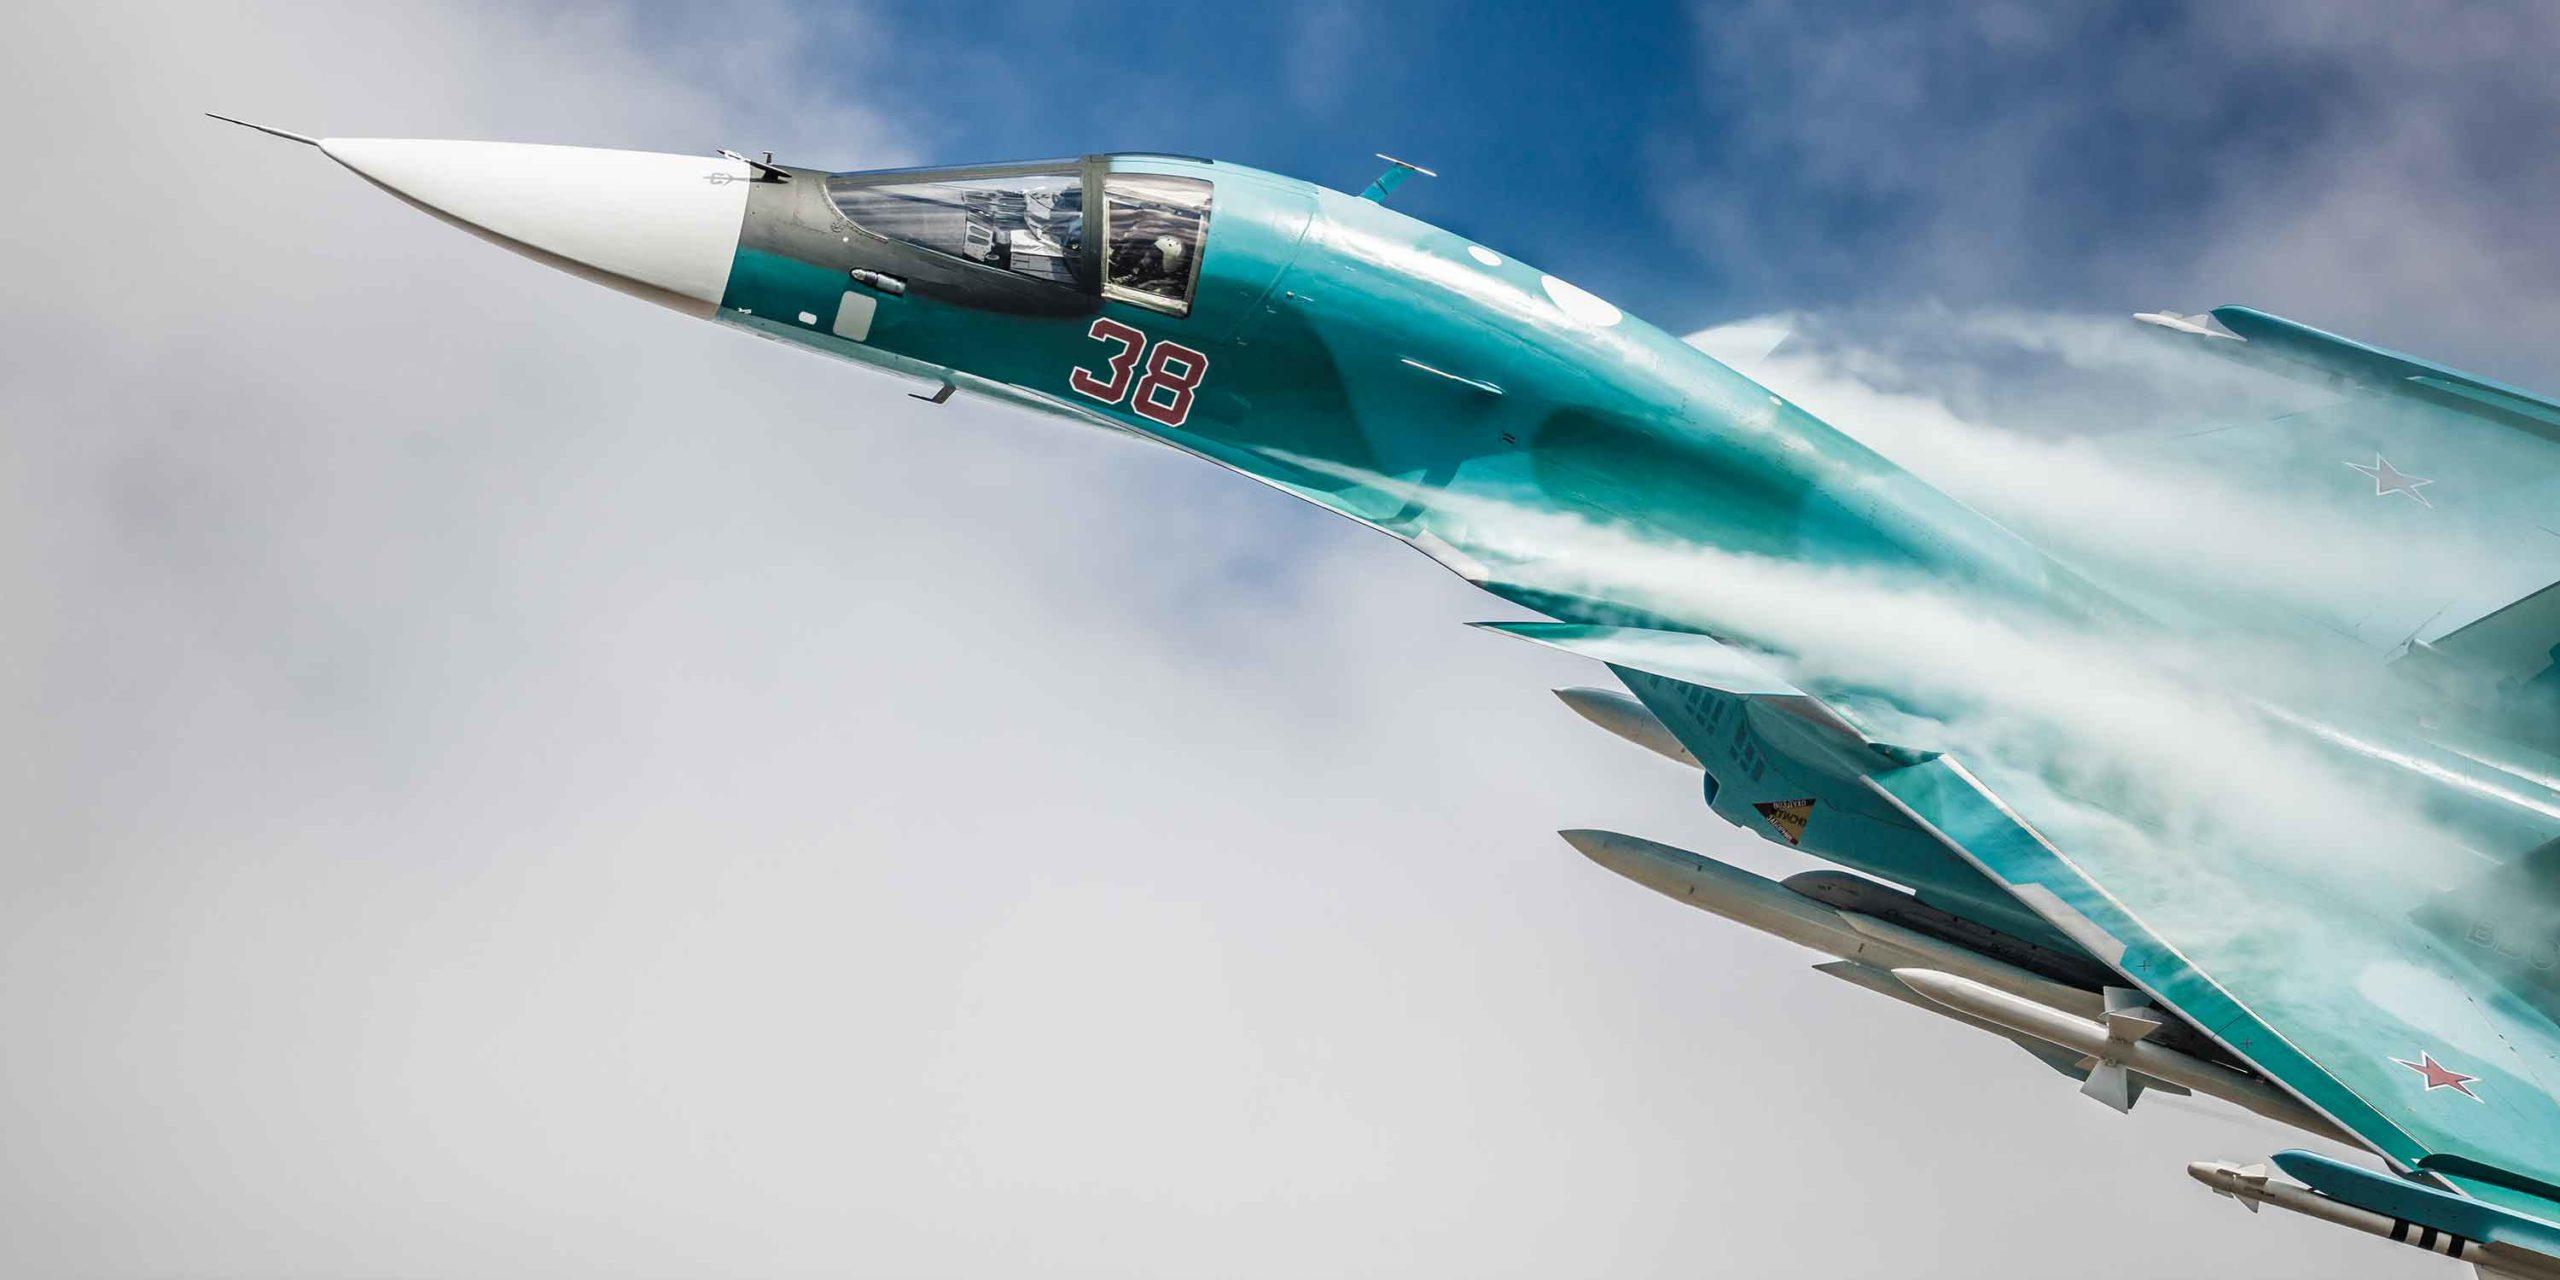 Airplane Sukhoi 34